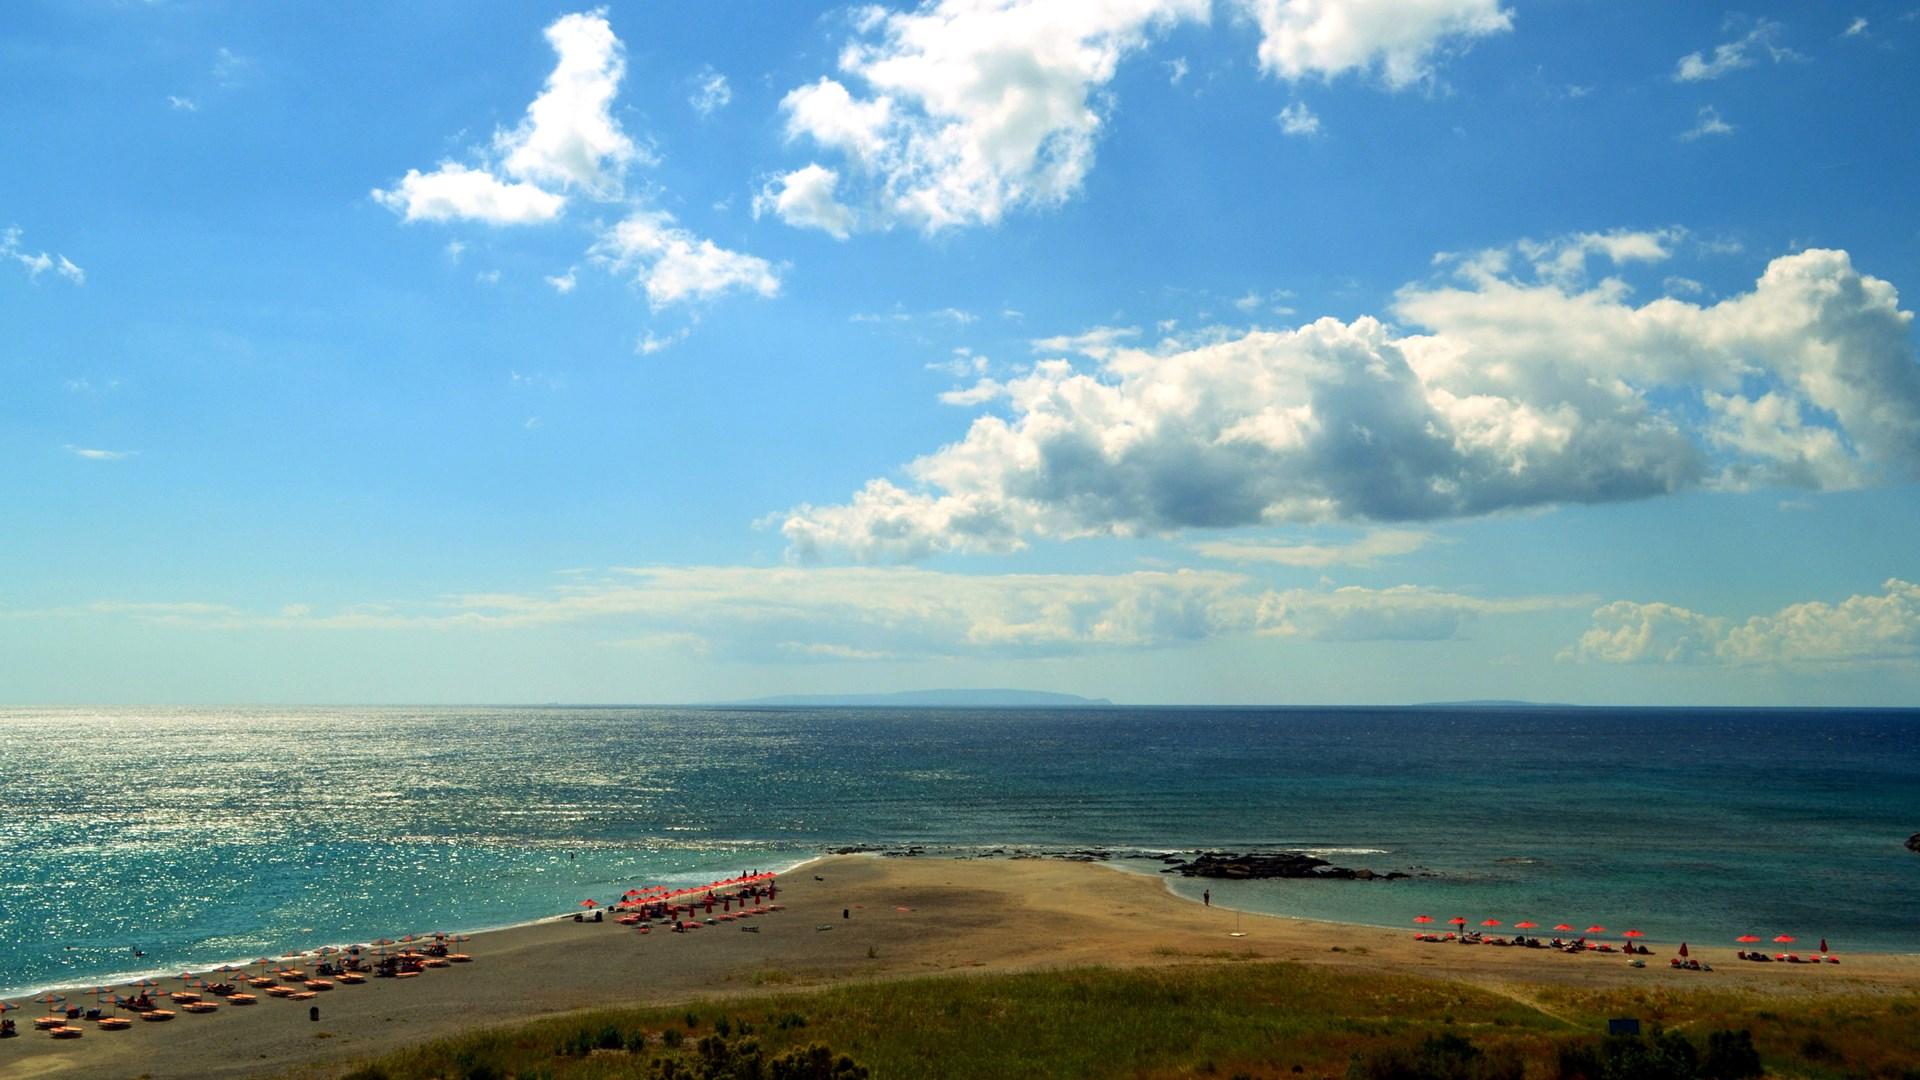 Frangokastello Beach in Sfakia, Chania - Crete   01 Oct 2017   Alargo